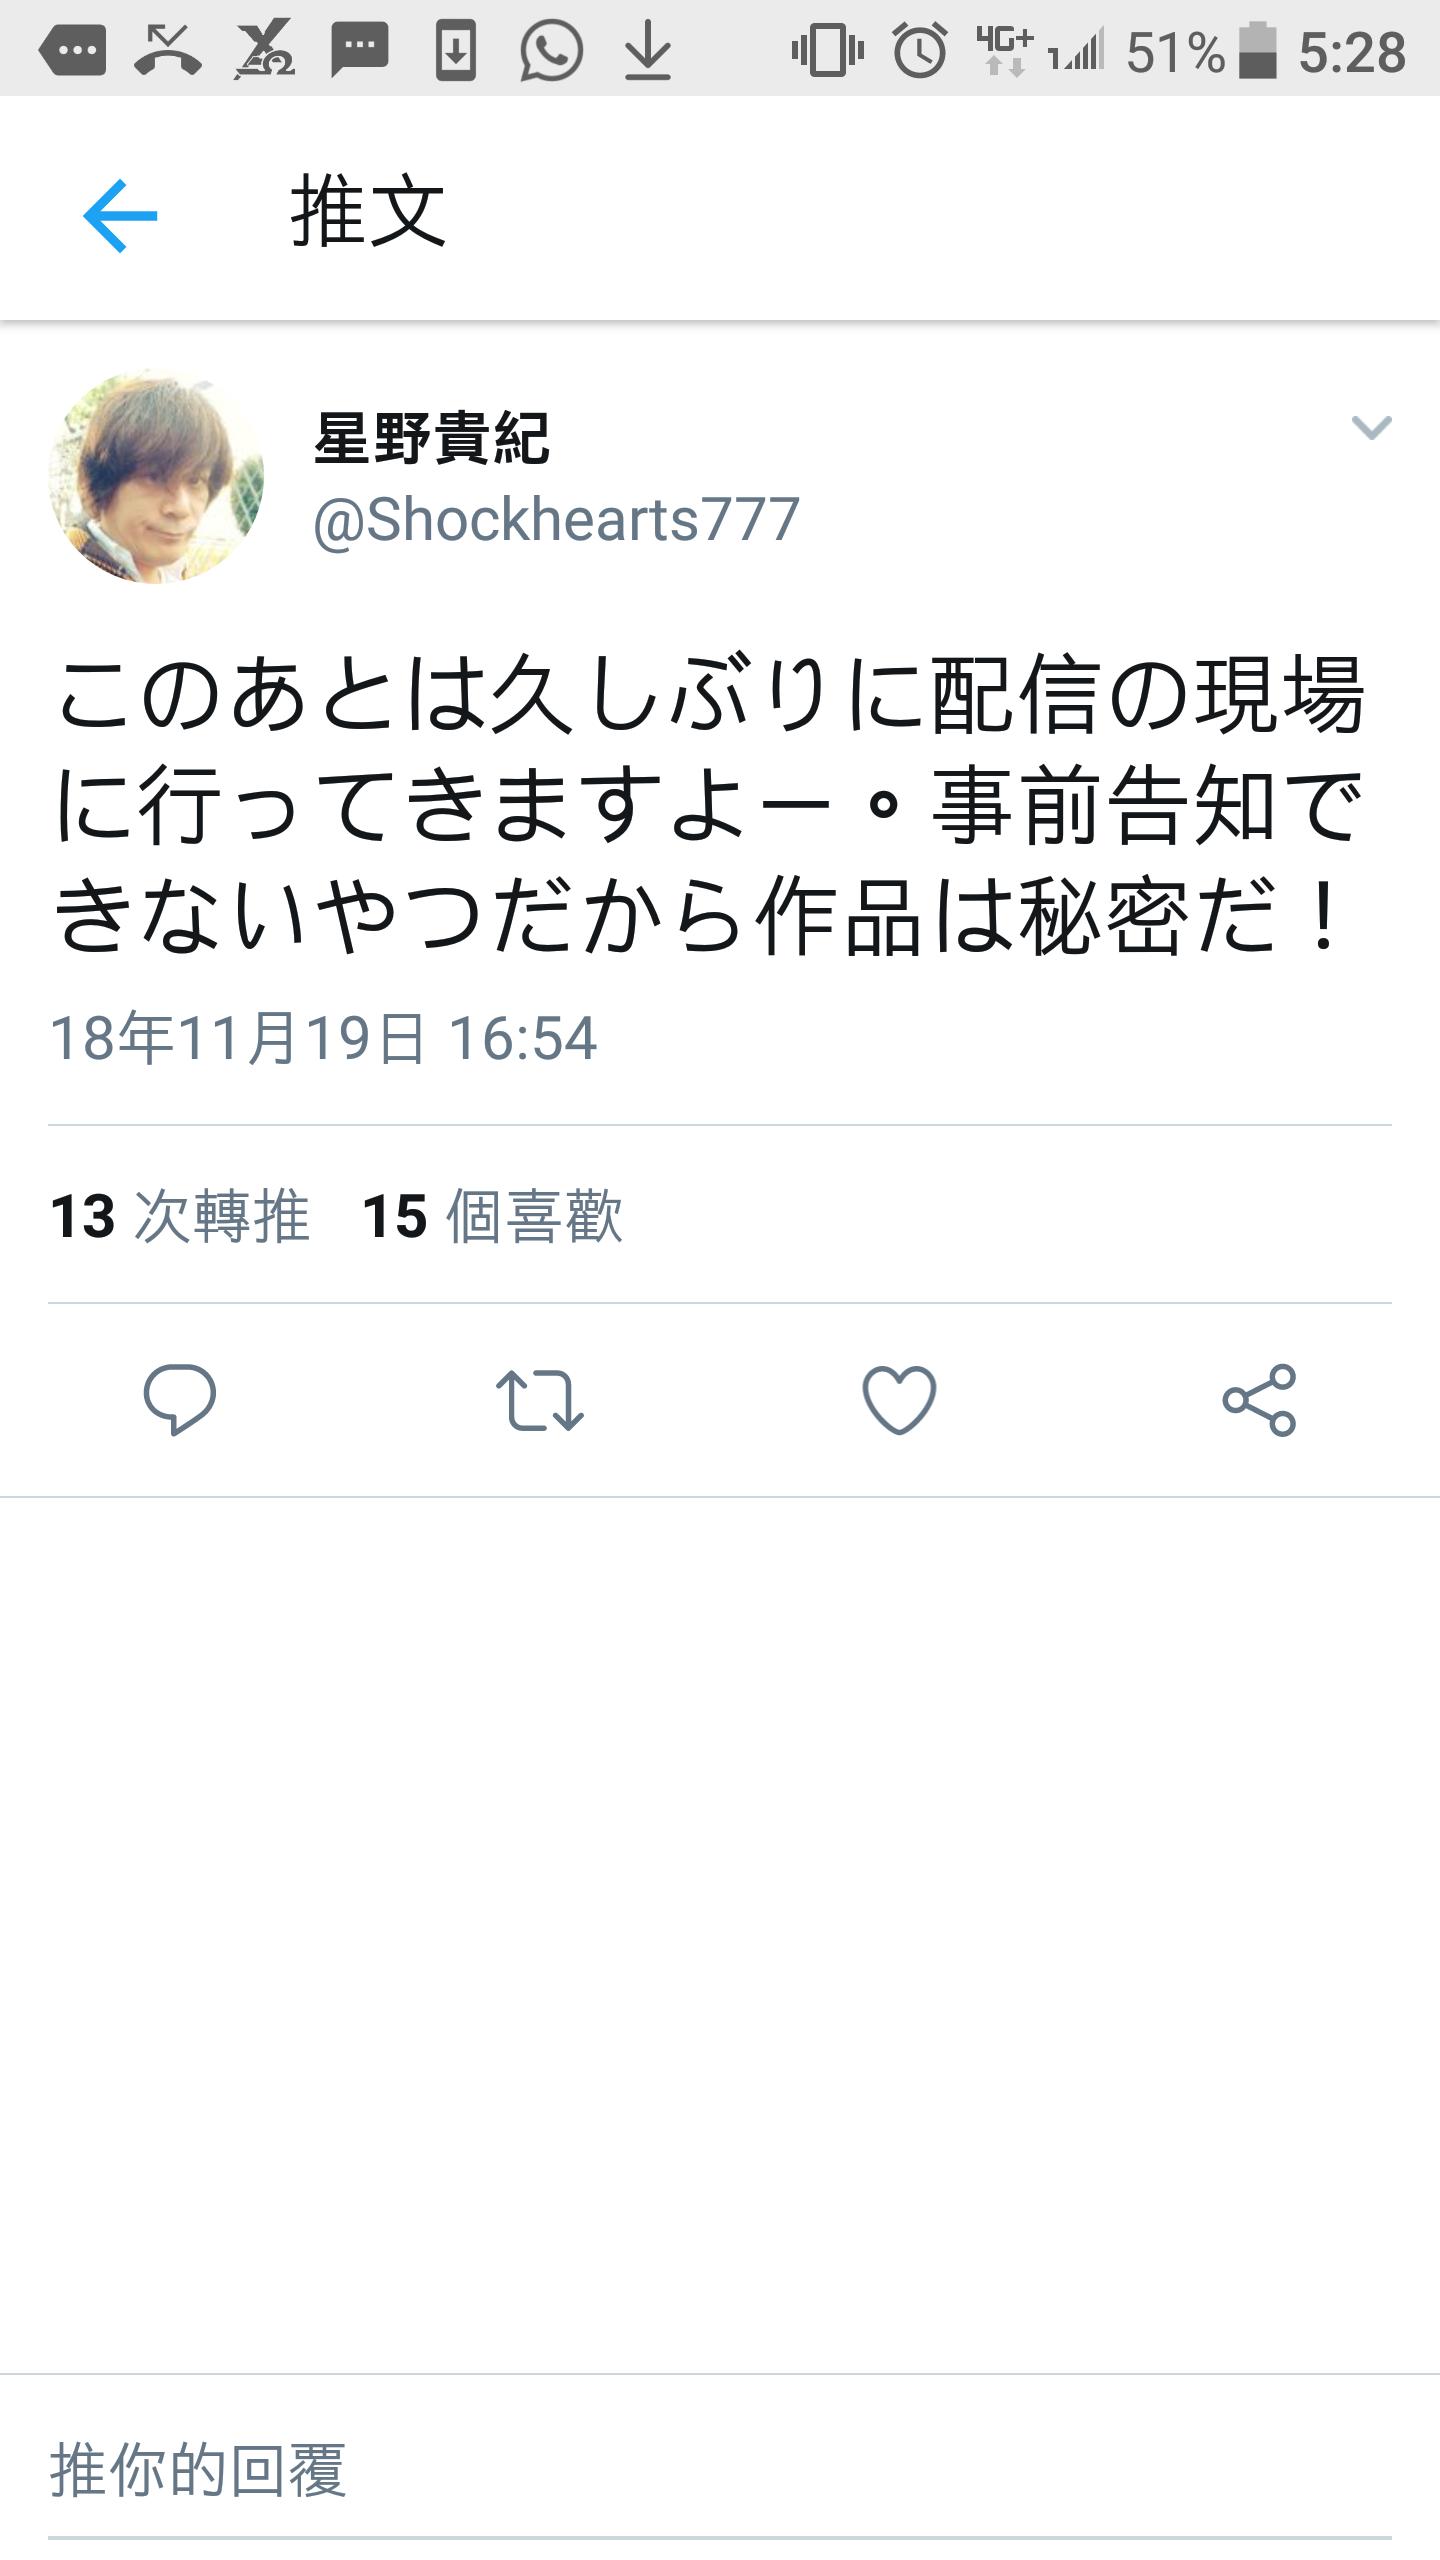 [img]https://upload.cc/i1/2018/11/19/GS60IA.png[/img]